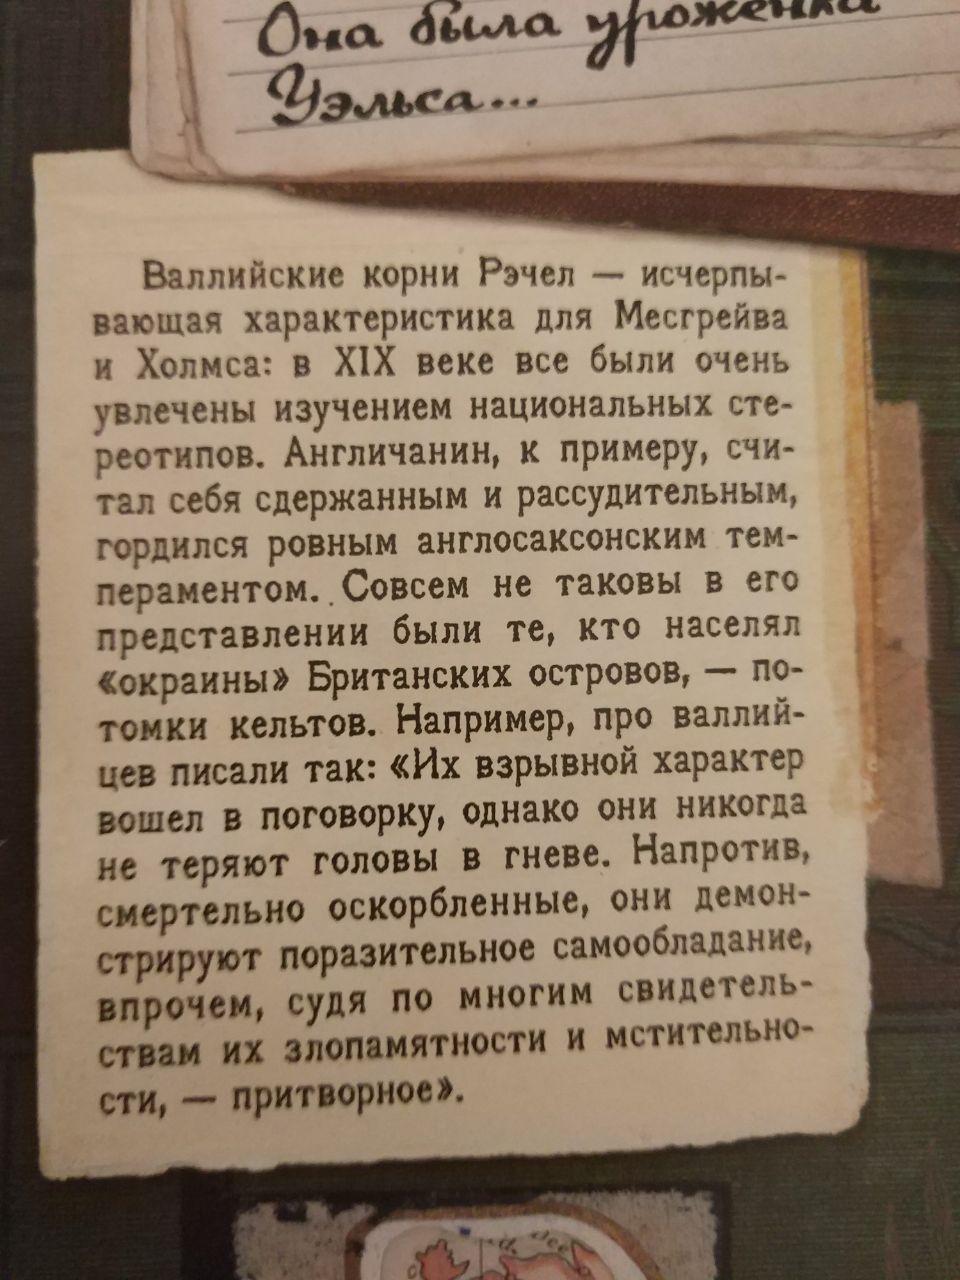 http://s3.uploads.ru/RQpdv.jpg